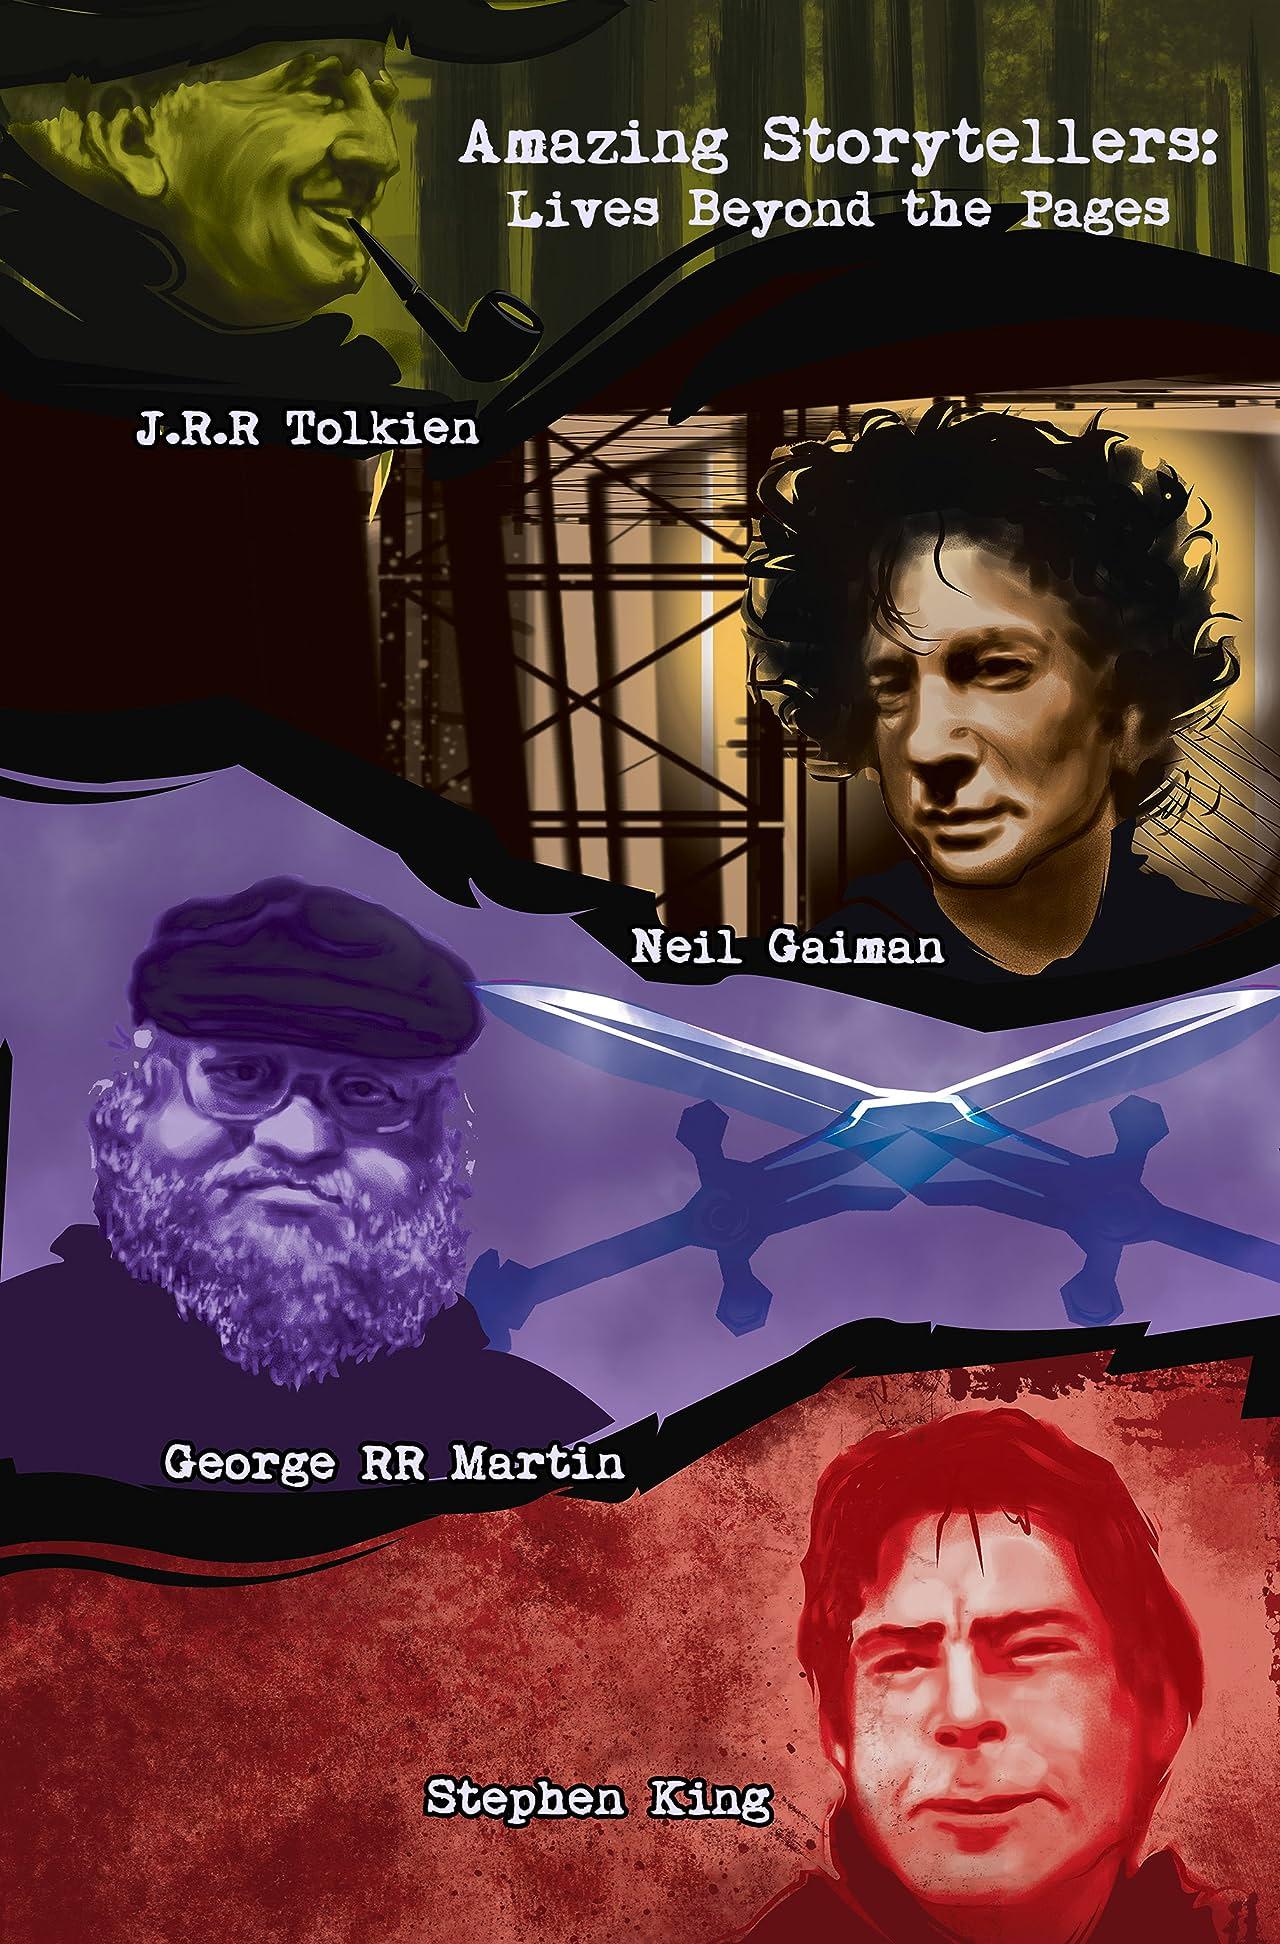 Amazing Storytellers: J.R.R Tolkien, George RR Martin, Neil Gaiman & Stephen King